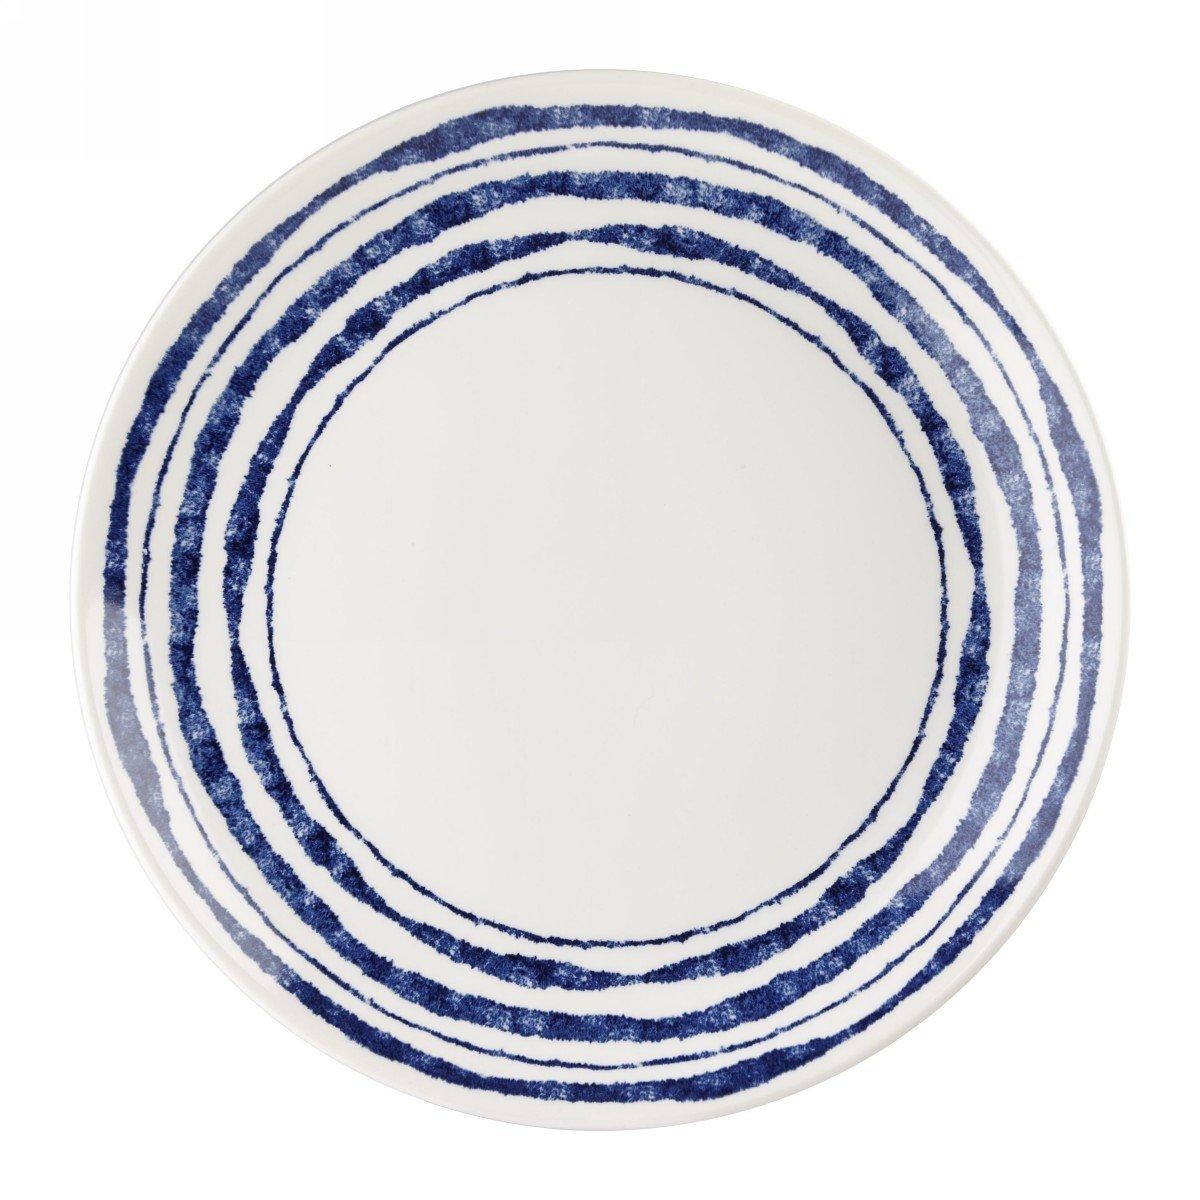 Тарелка столовая Churchill 26 см Инки от Sieni